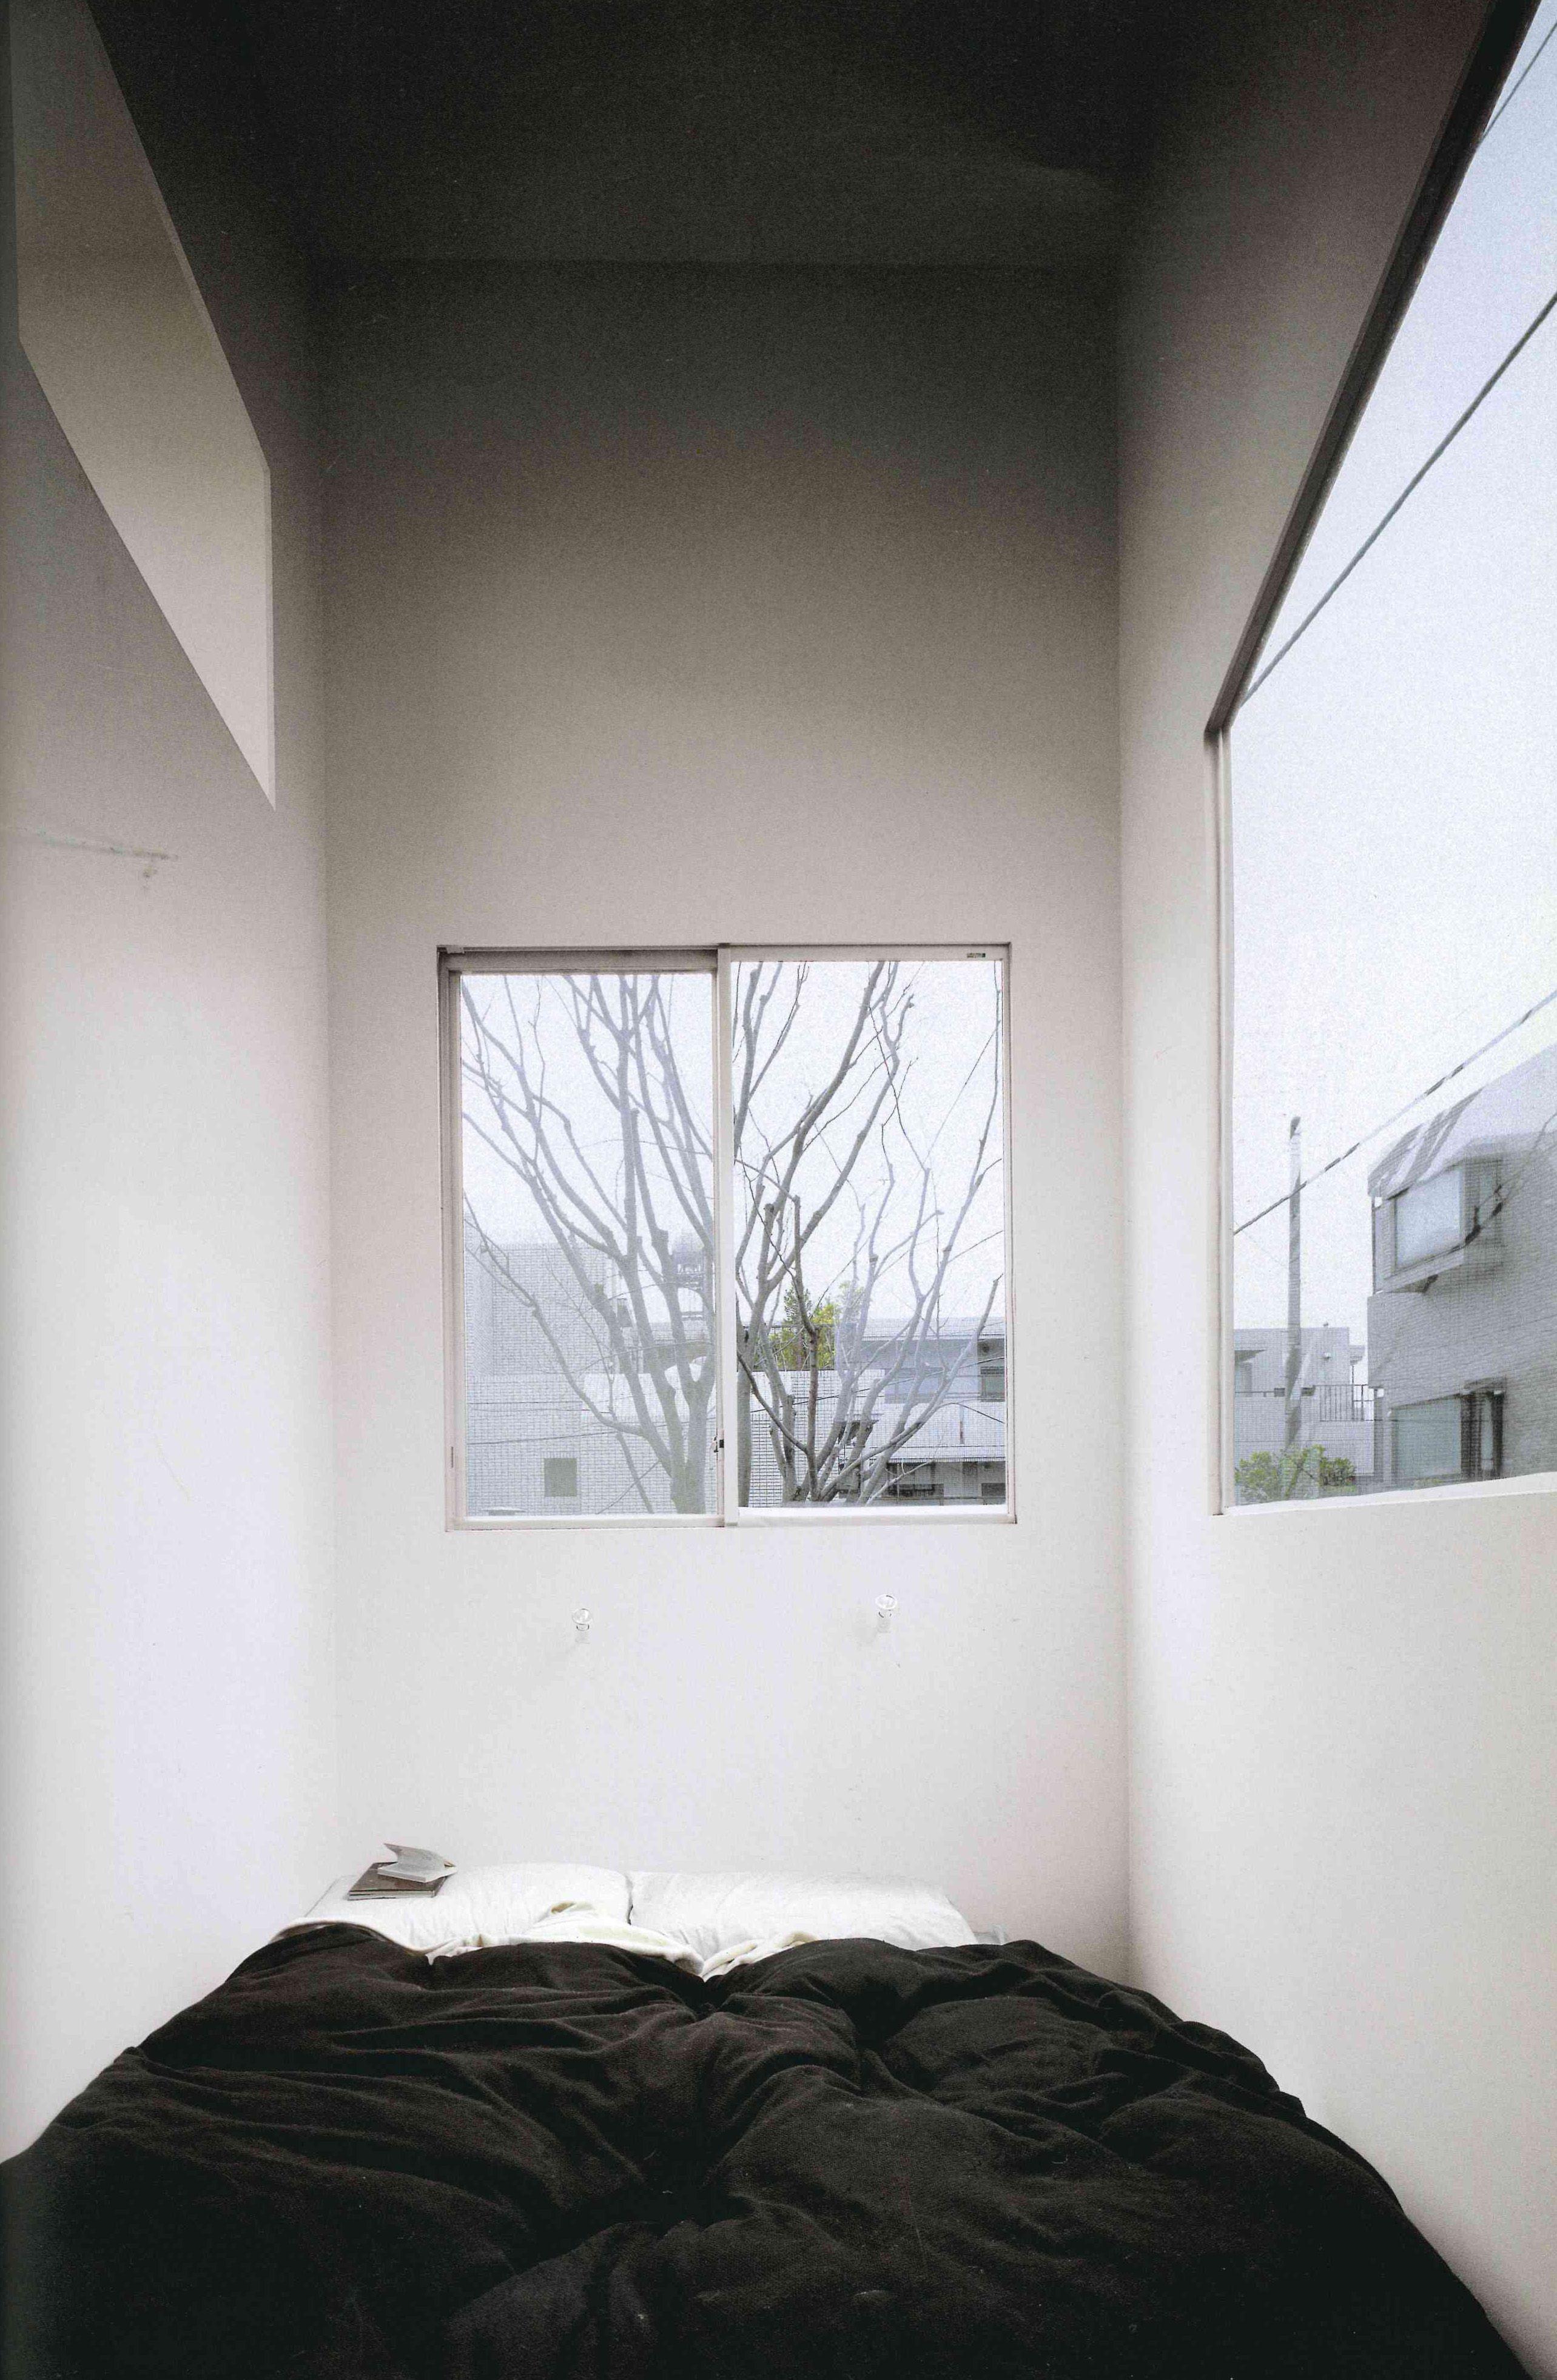 Sejima plum grove house pesquisa google haus haus architektur atmosph re - Japanische innenarchitektur ...